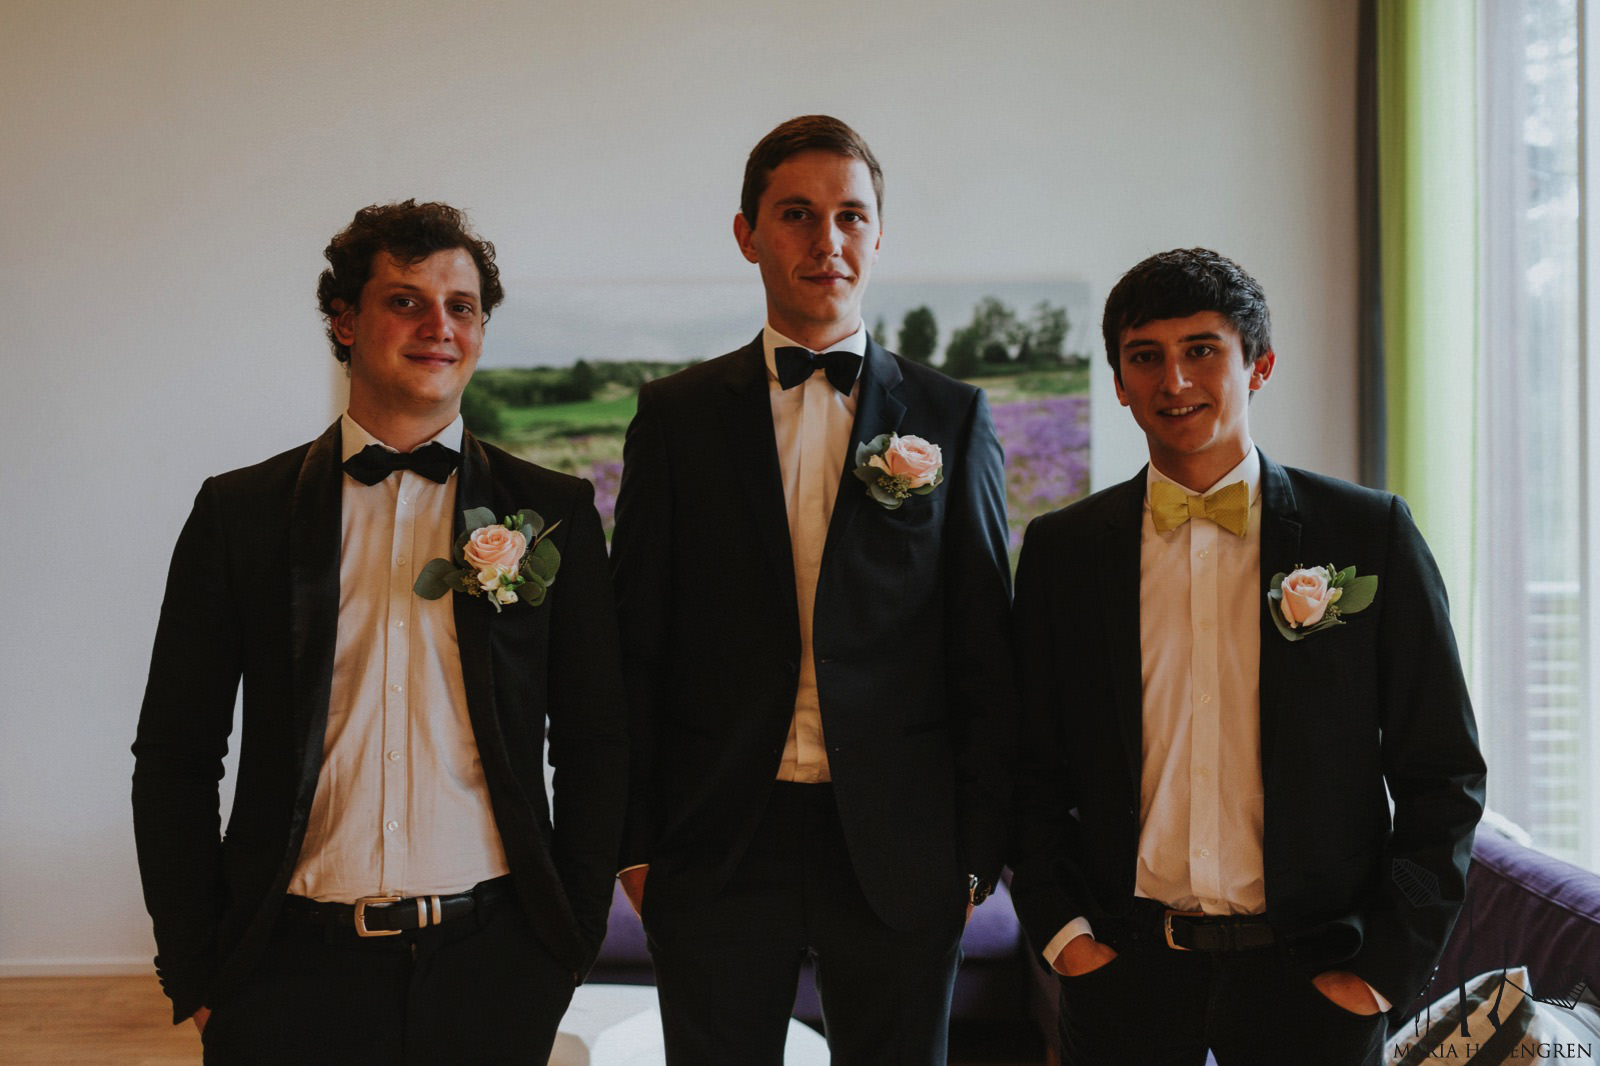 French groomsmen